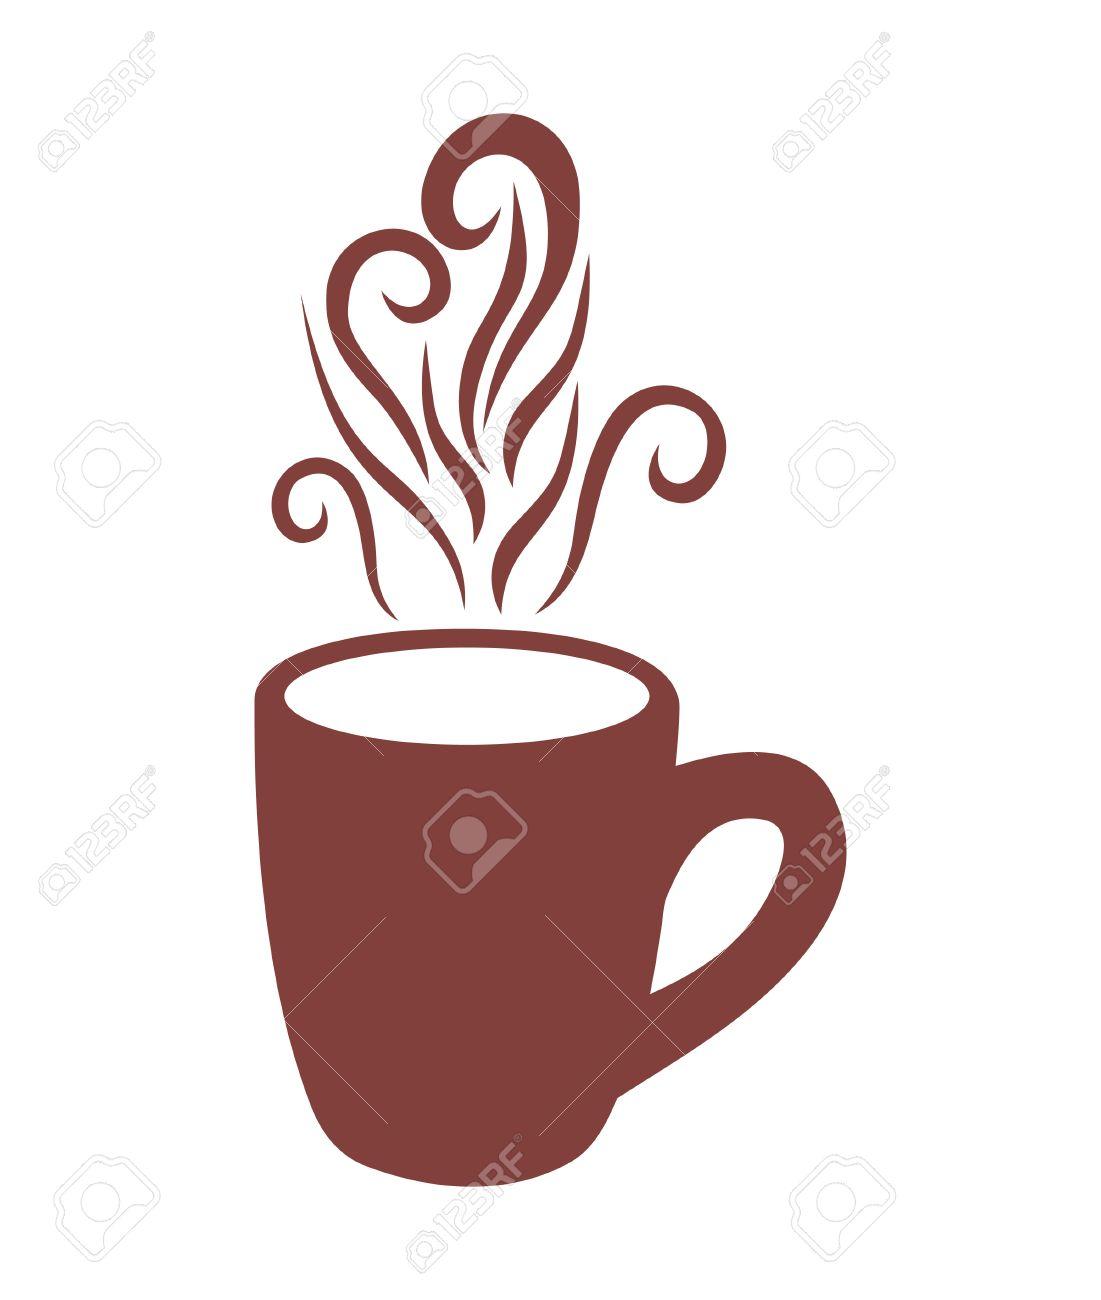 Coffee cup vector free - Coffee Mug Vector Icon Stock Vector 58154363